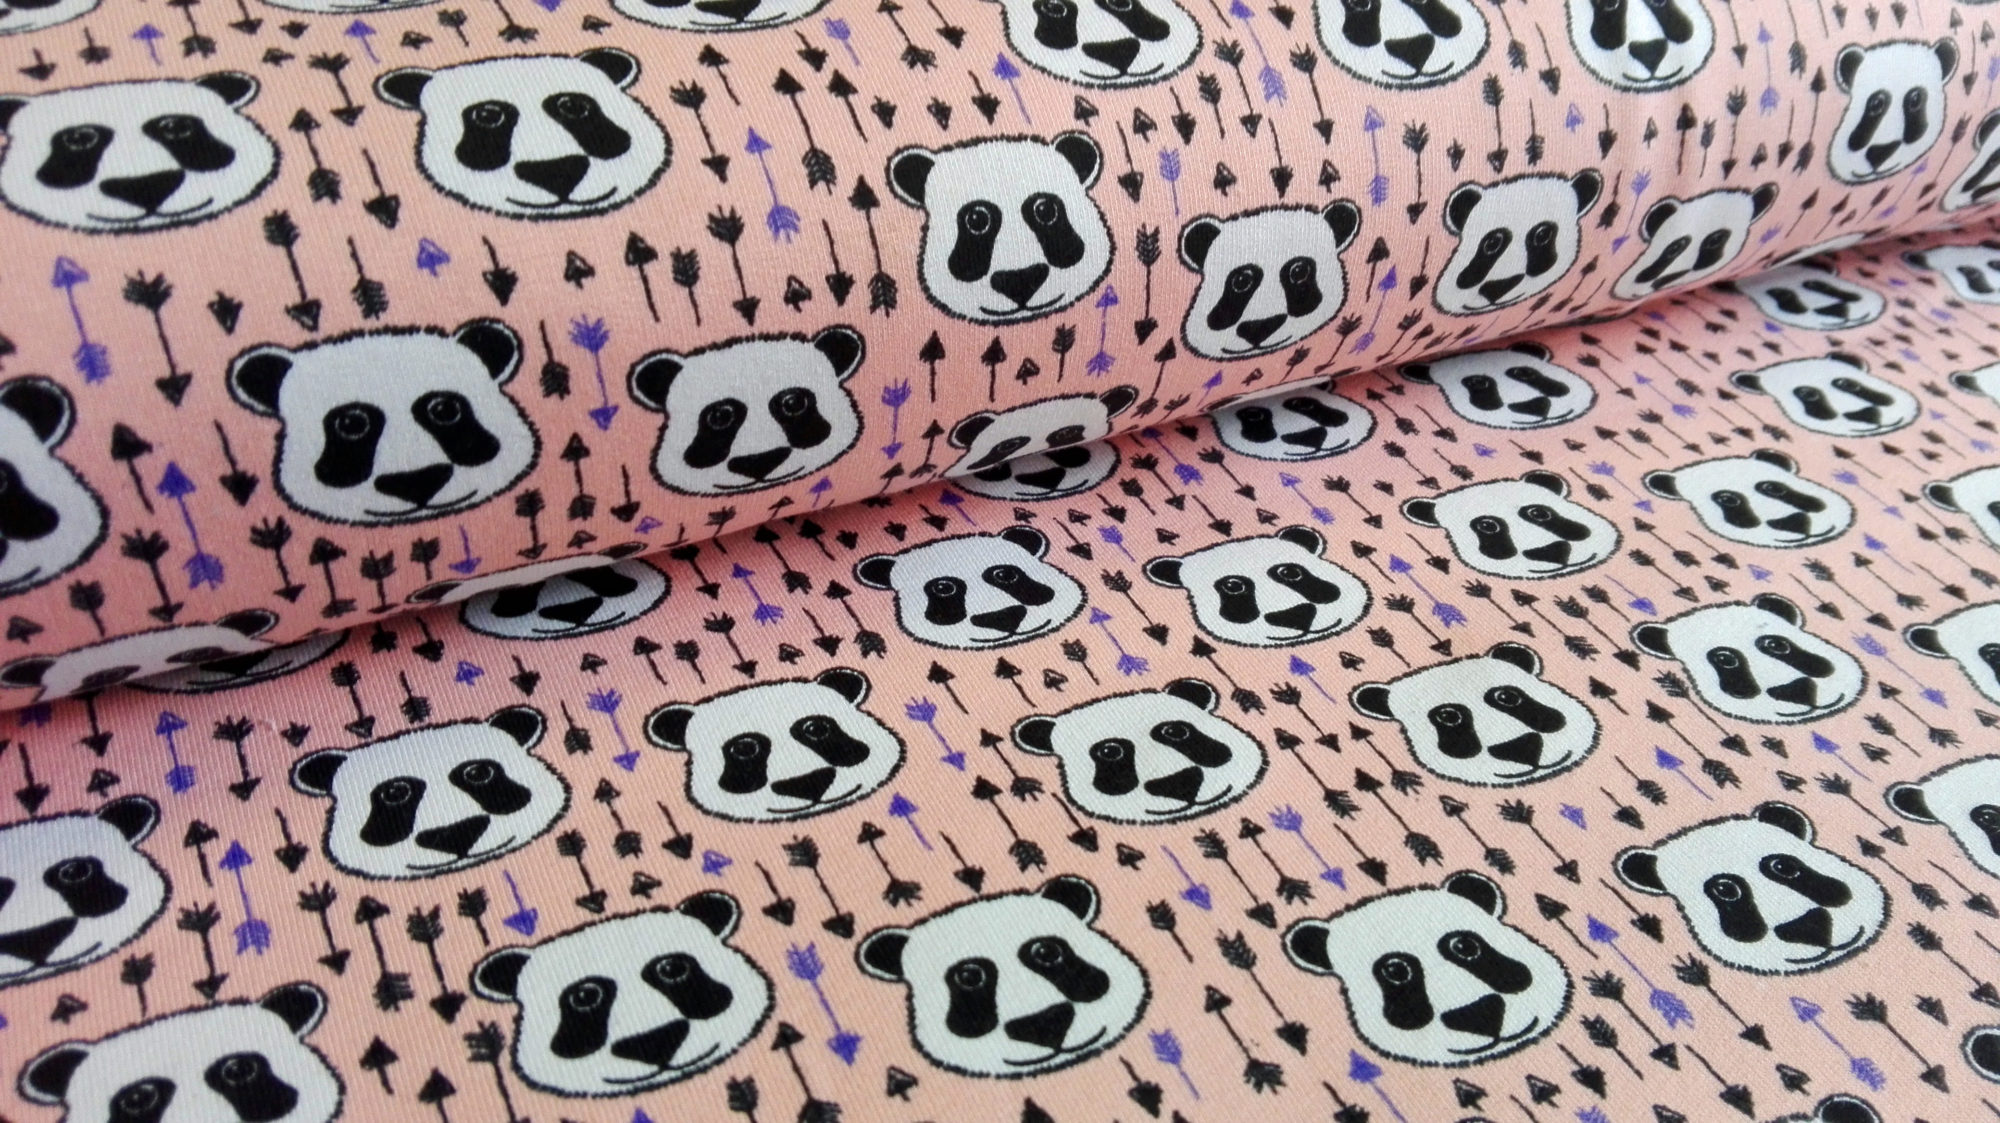 Sommersweat Sweat Pandas Panda Bear Pfeile peach Stoff • Stoff-Shop ...